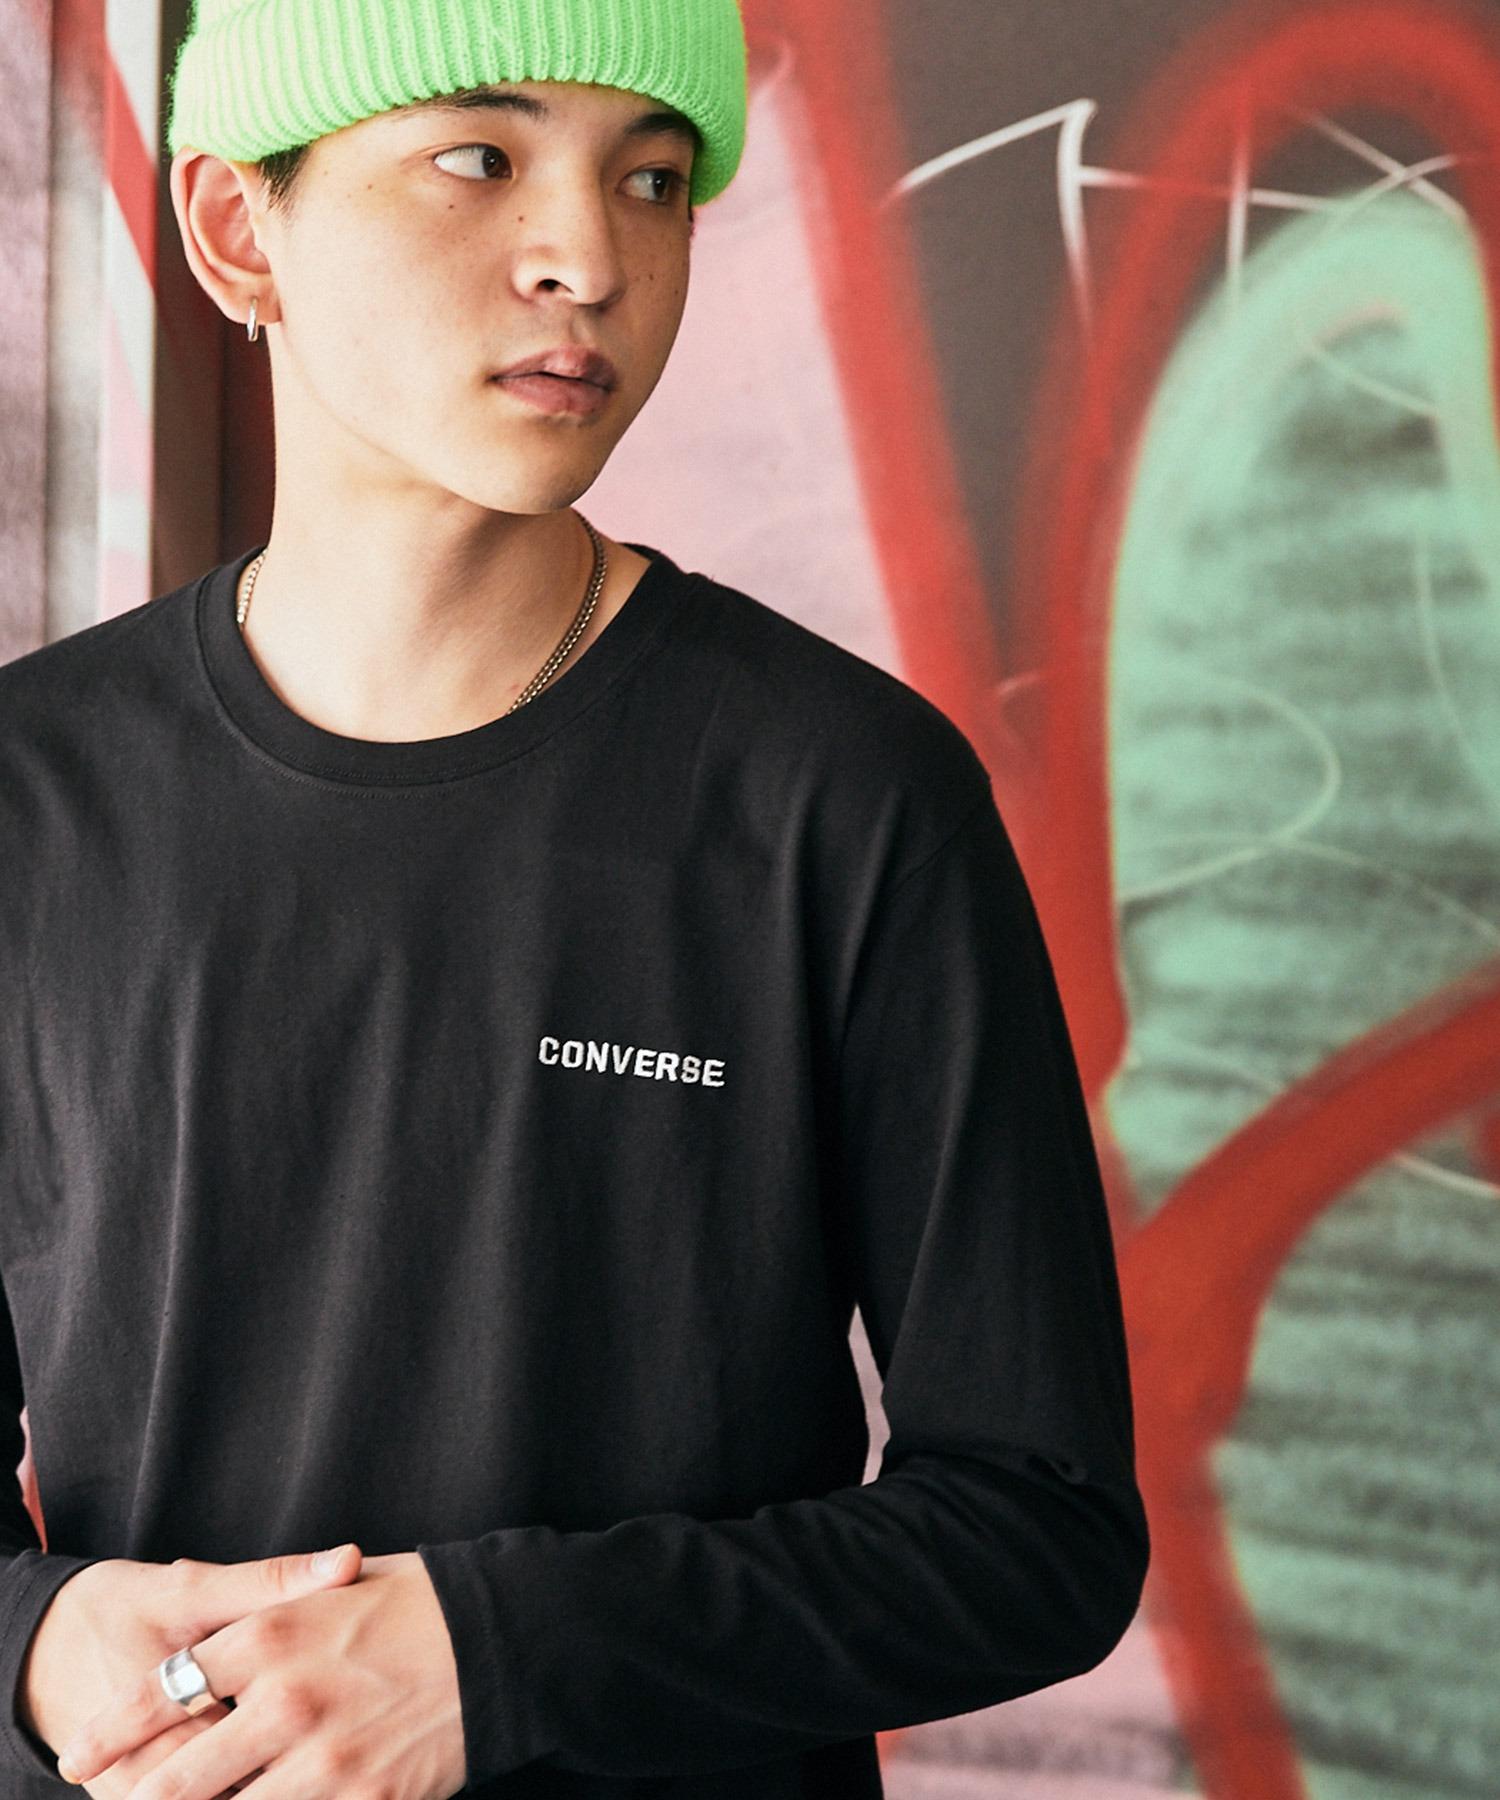 CONVERSE/コンバース 天竺 刺繍ロゴ L/S Tシャツ/長袖ティーシャツ